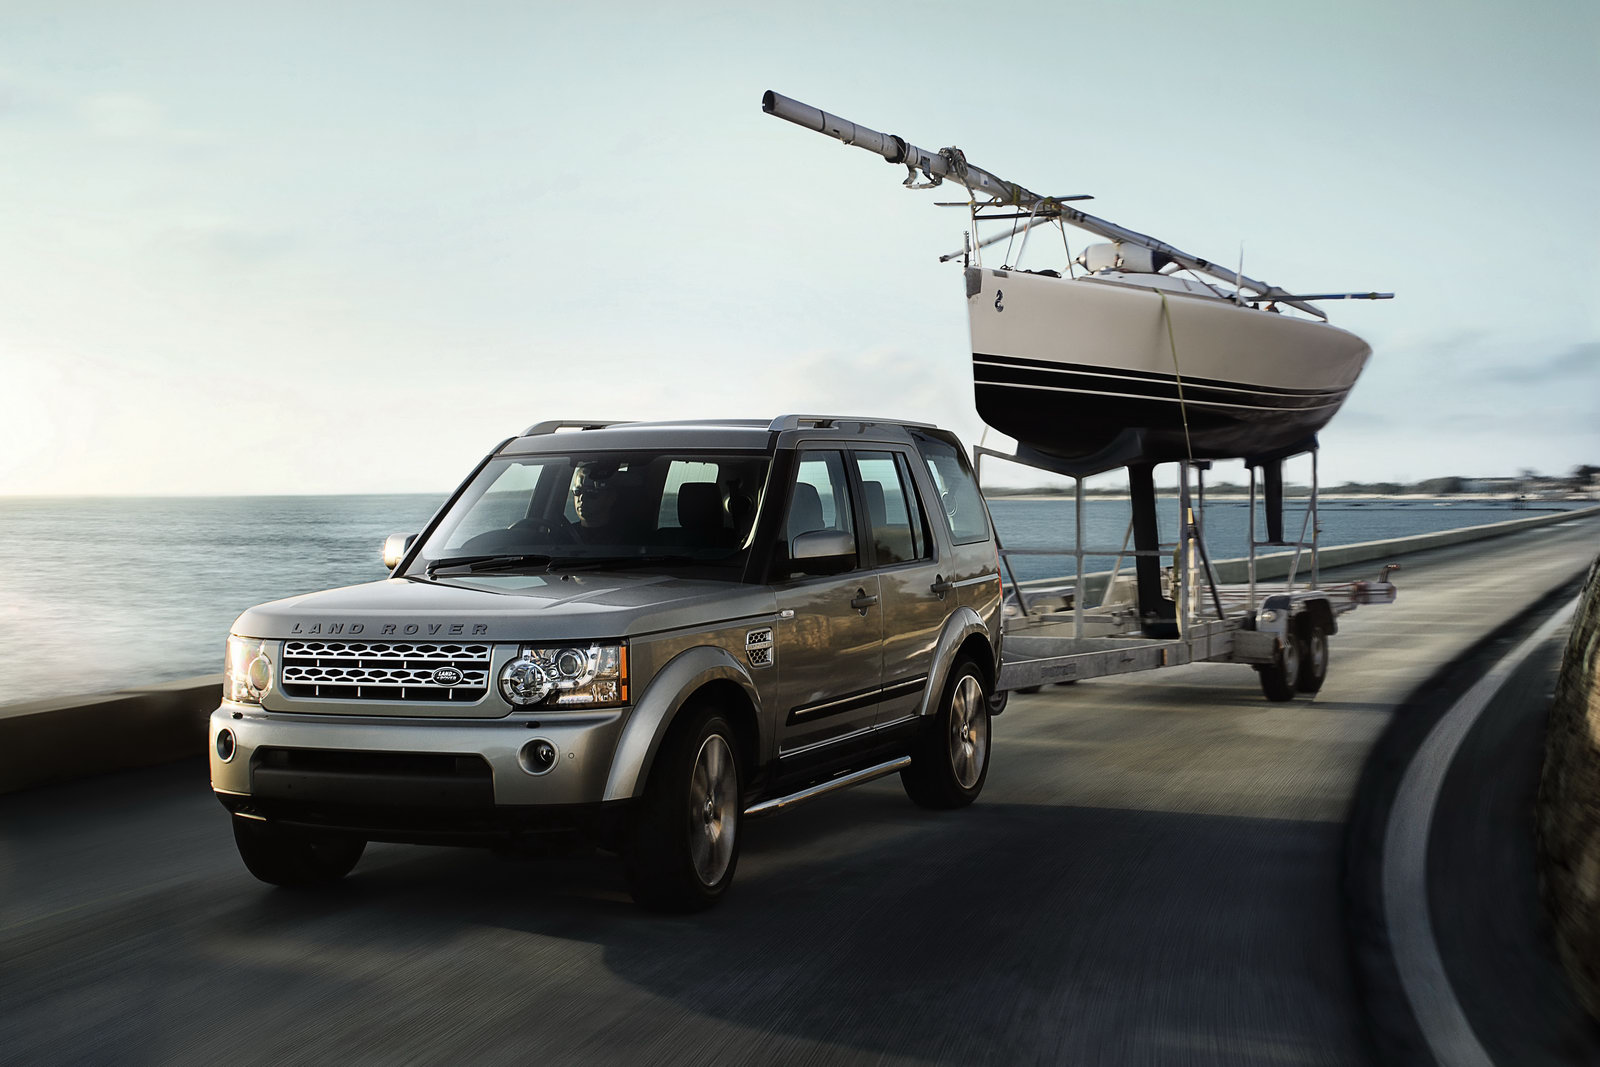 land rover discovery 4 range rover sport 2012. Black Bedroom Furniture Sets. Home Design Ideas